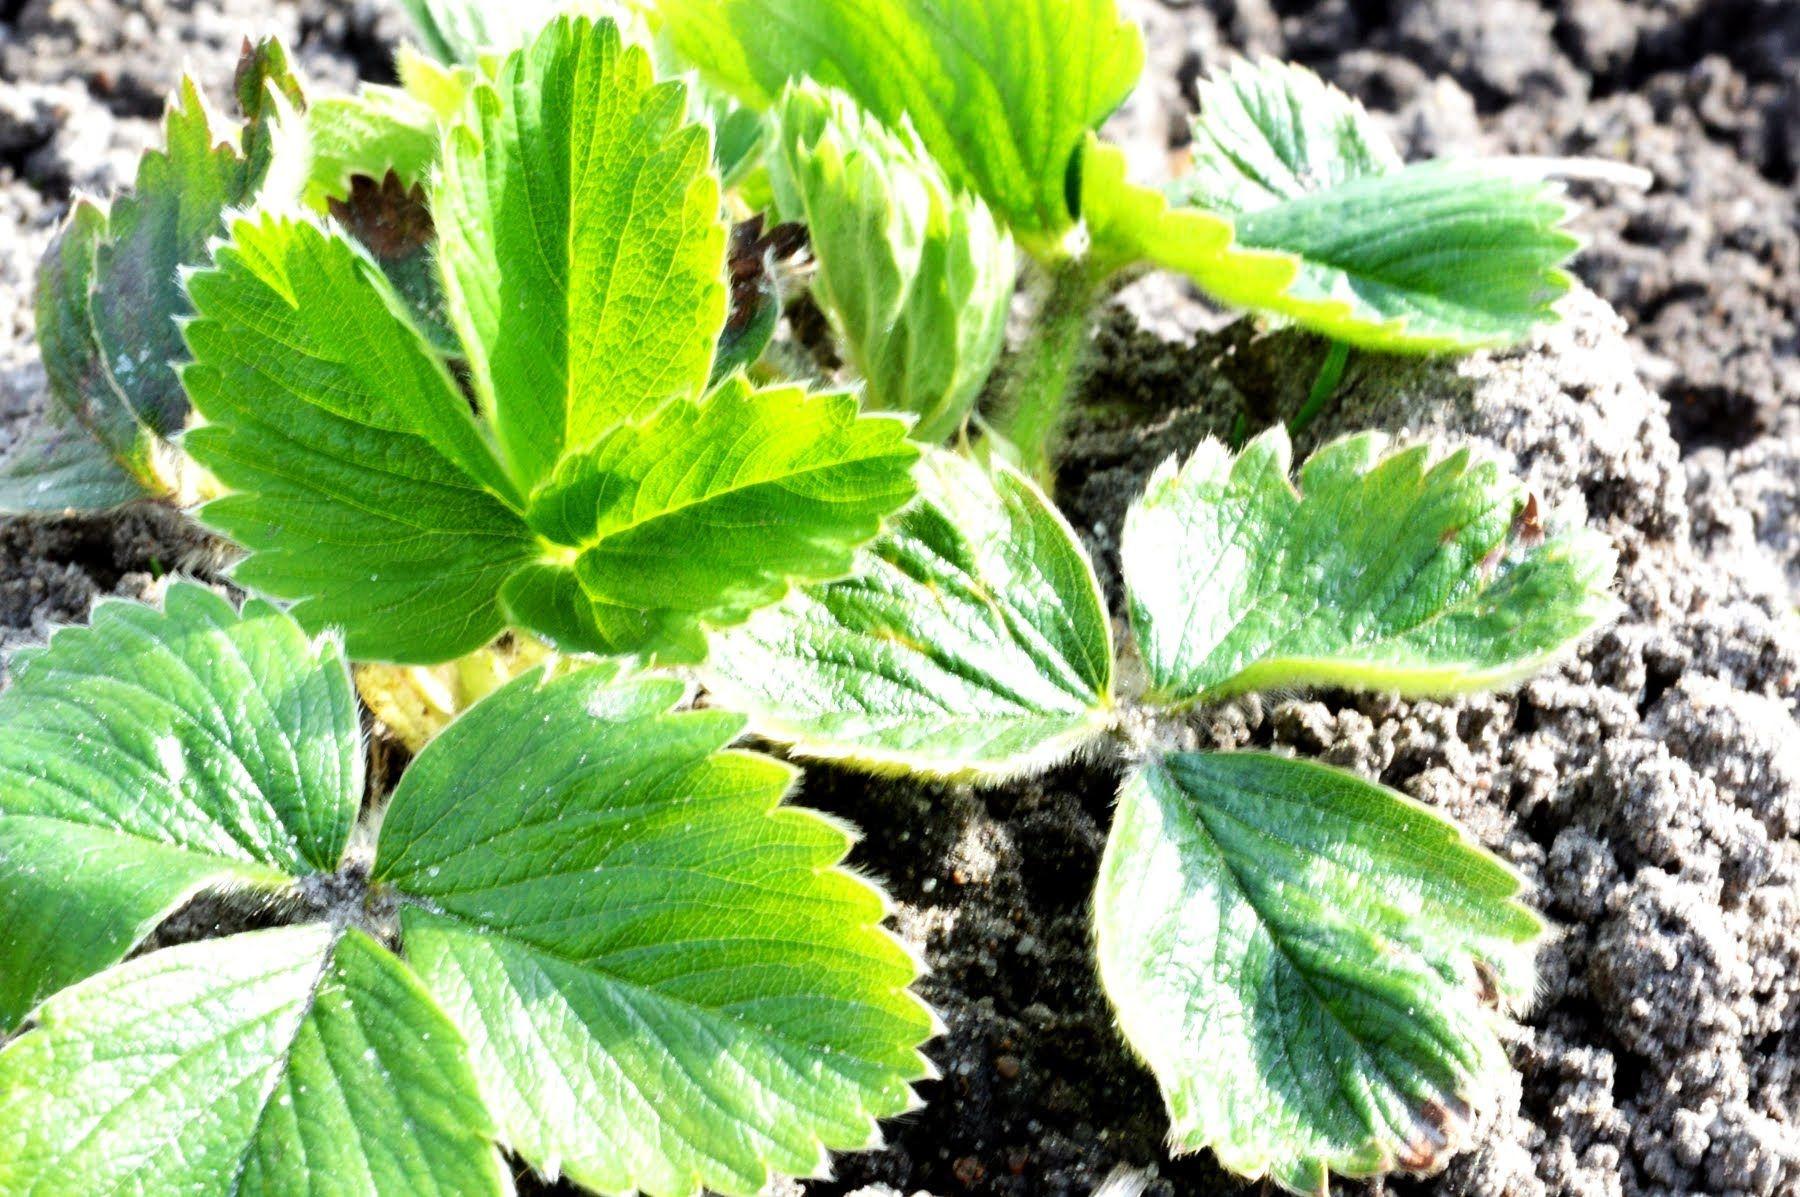 Jak Sadzic Truskawki I Maliny Www Kasia In Plant Leaves Plants Leaves